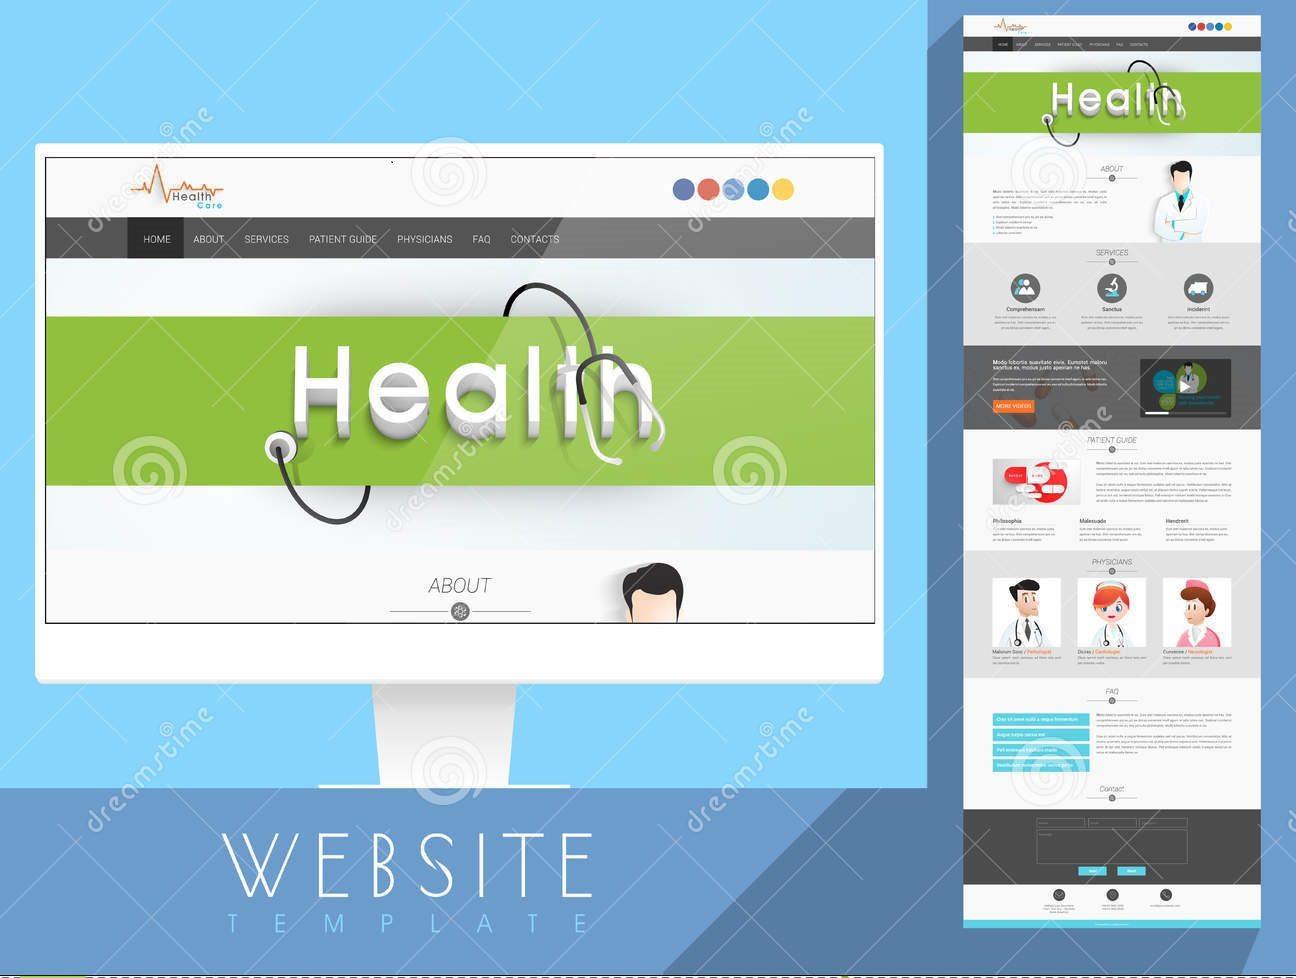 Jasa Website Rumah Sakit Pasuruan 082225316999